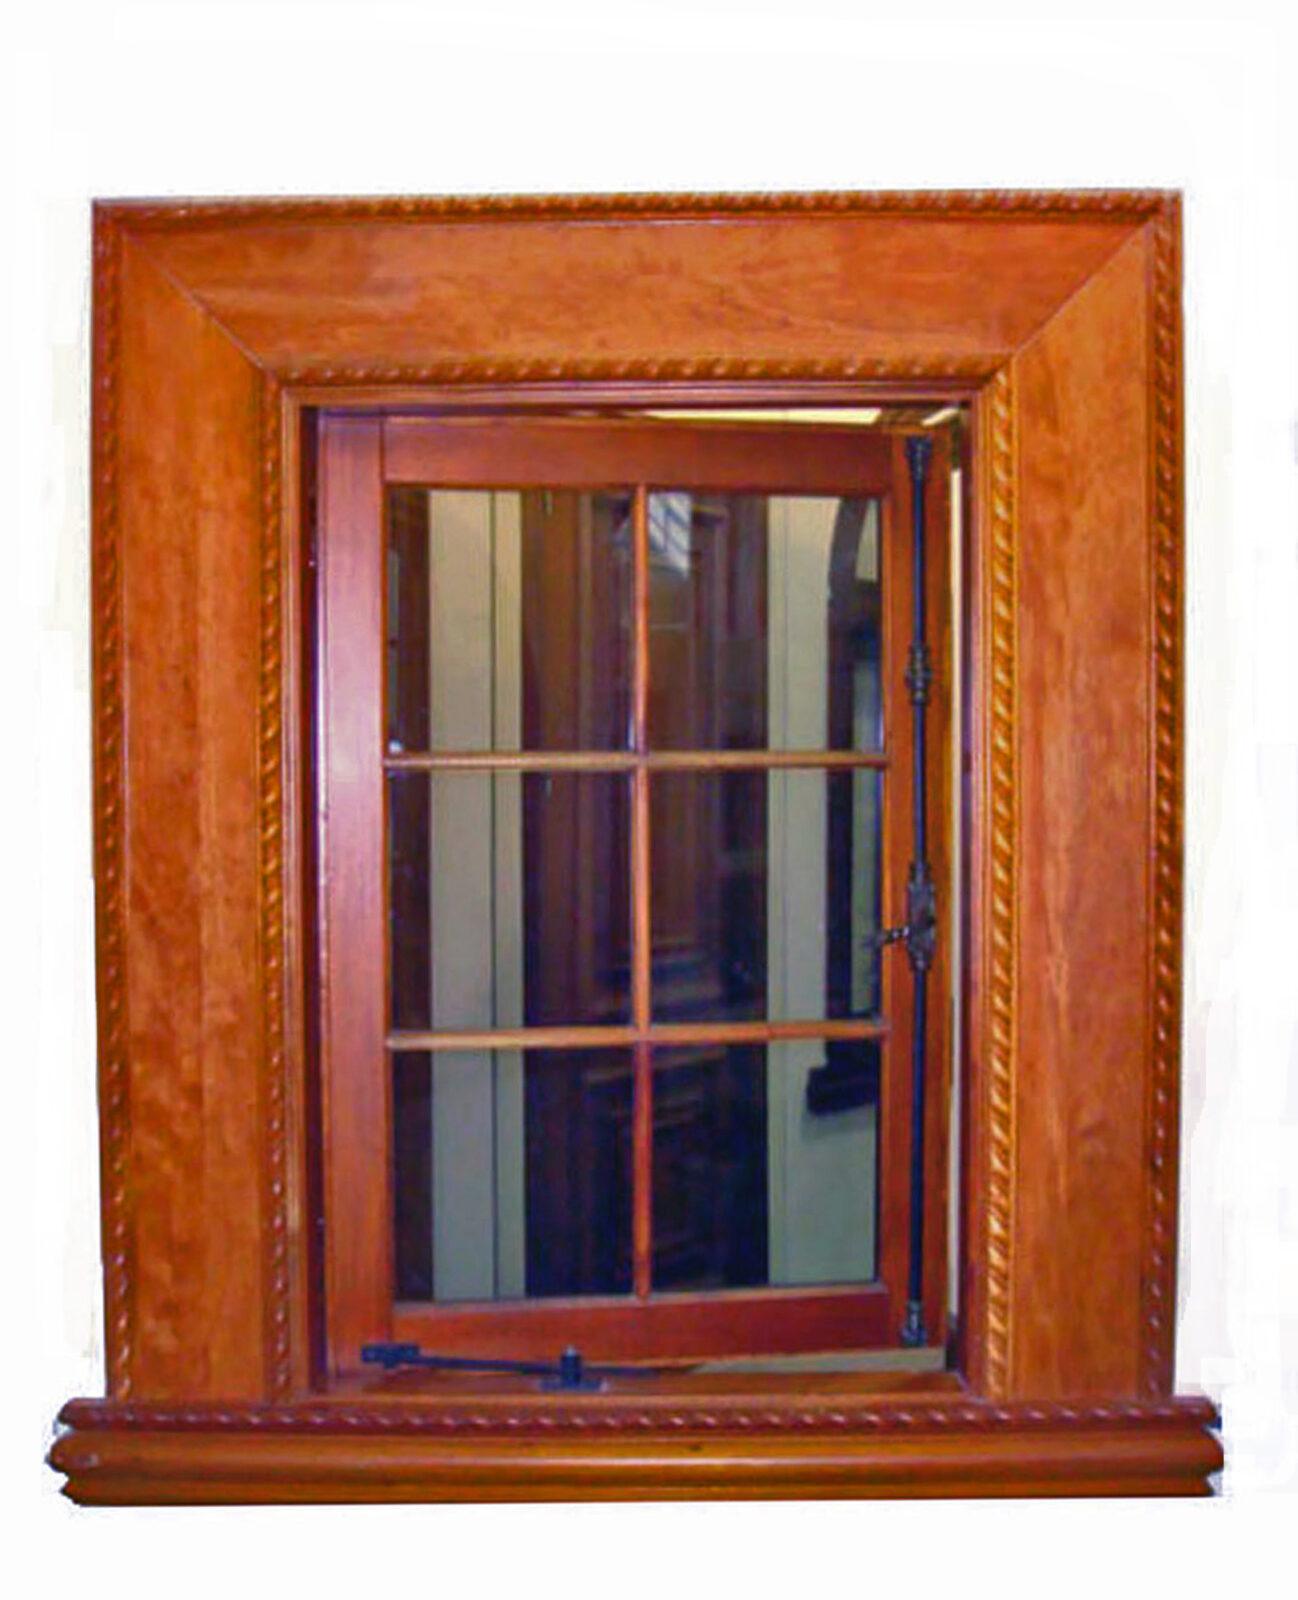 MIRAMAR MAHOGANY CASEMENT WINDOW